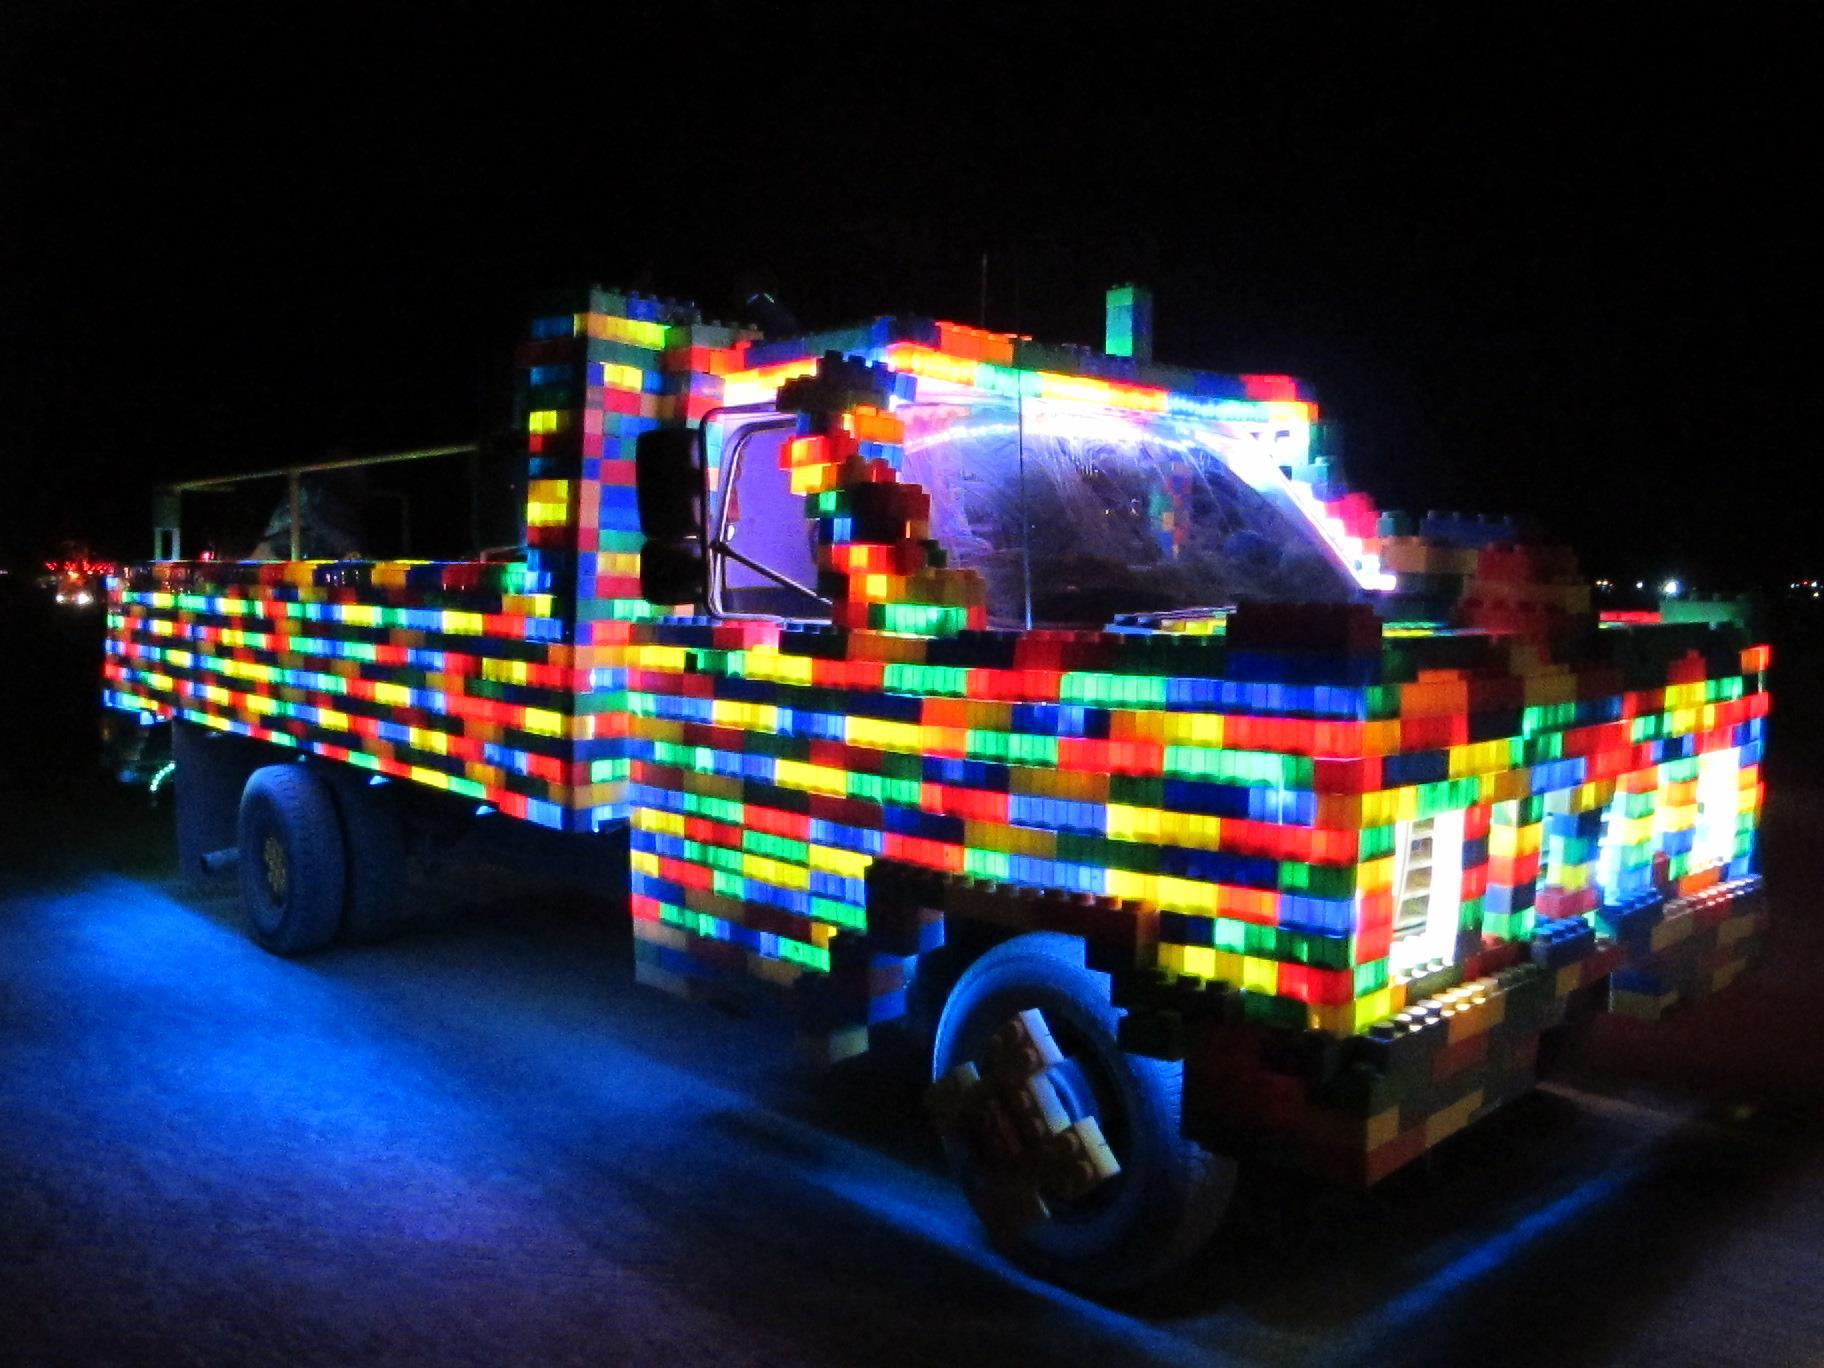 e05c5d8f06 File LEGO Truck Burning Man 2011 Night.jpg - Wikimedia Commons